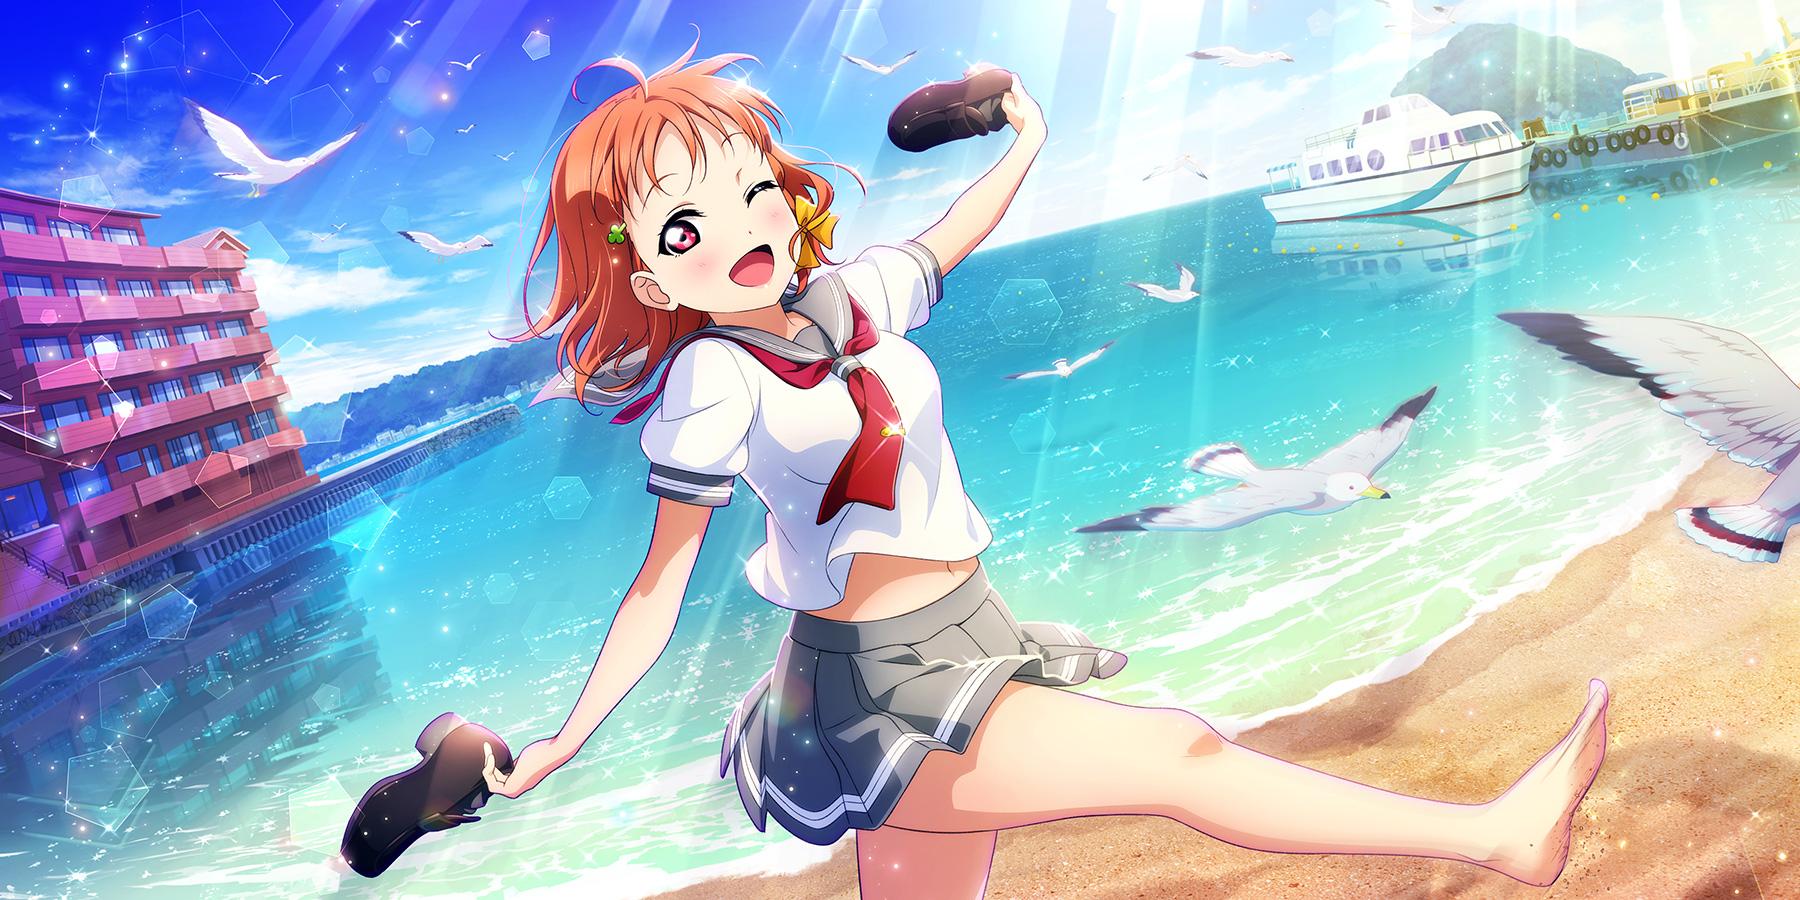 Takami Chika Chika Takami Love Live Sunshine Wallpaper 2707807 Zerochan Anime Image Board